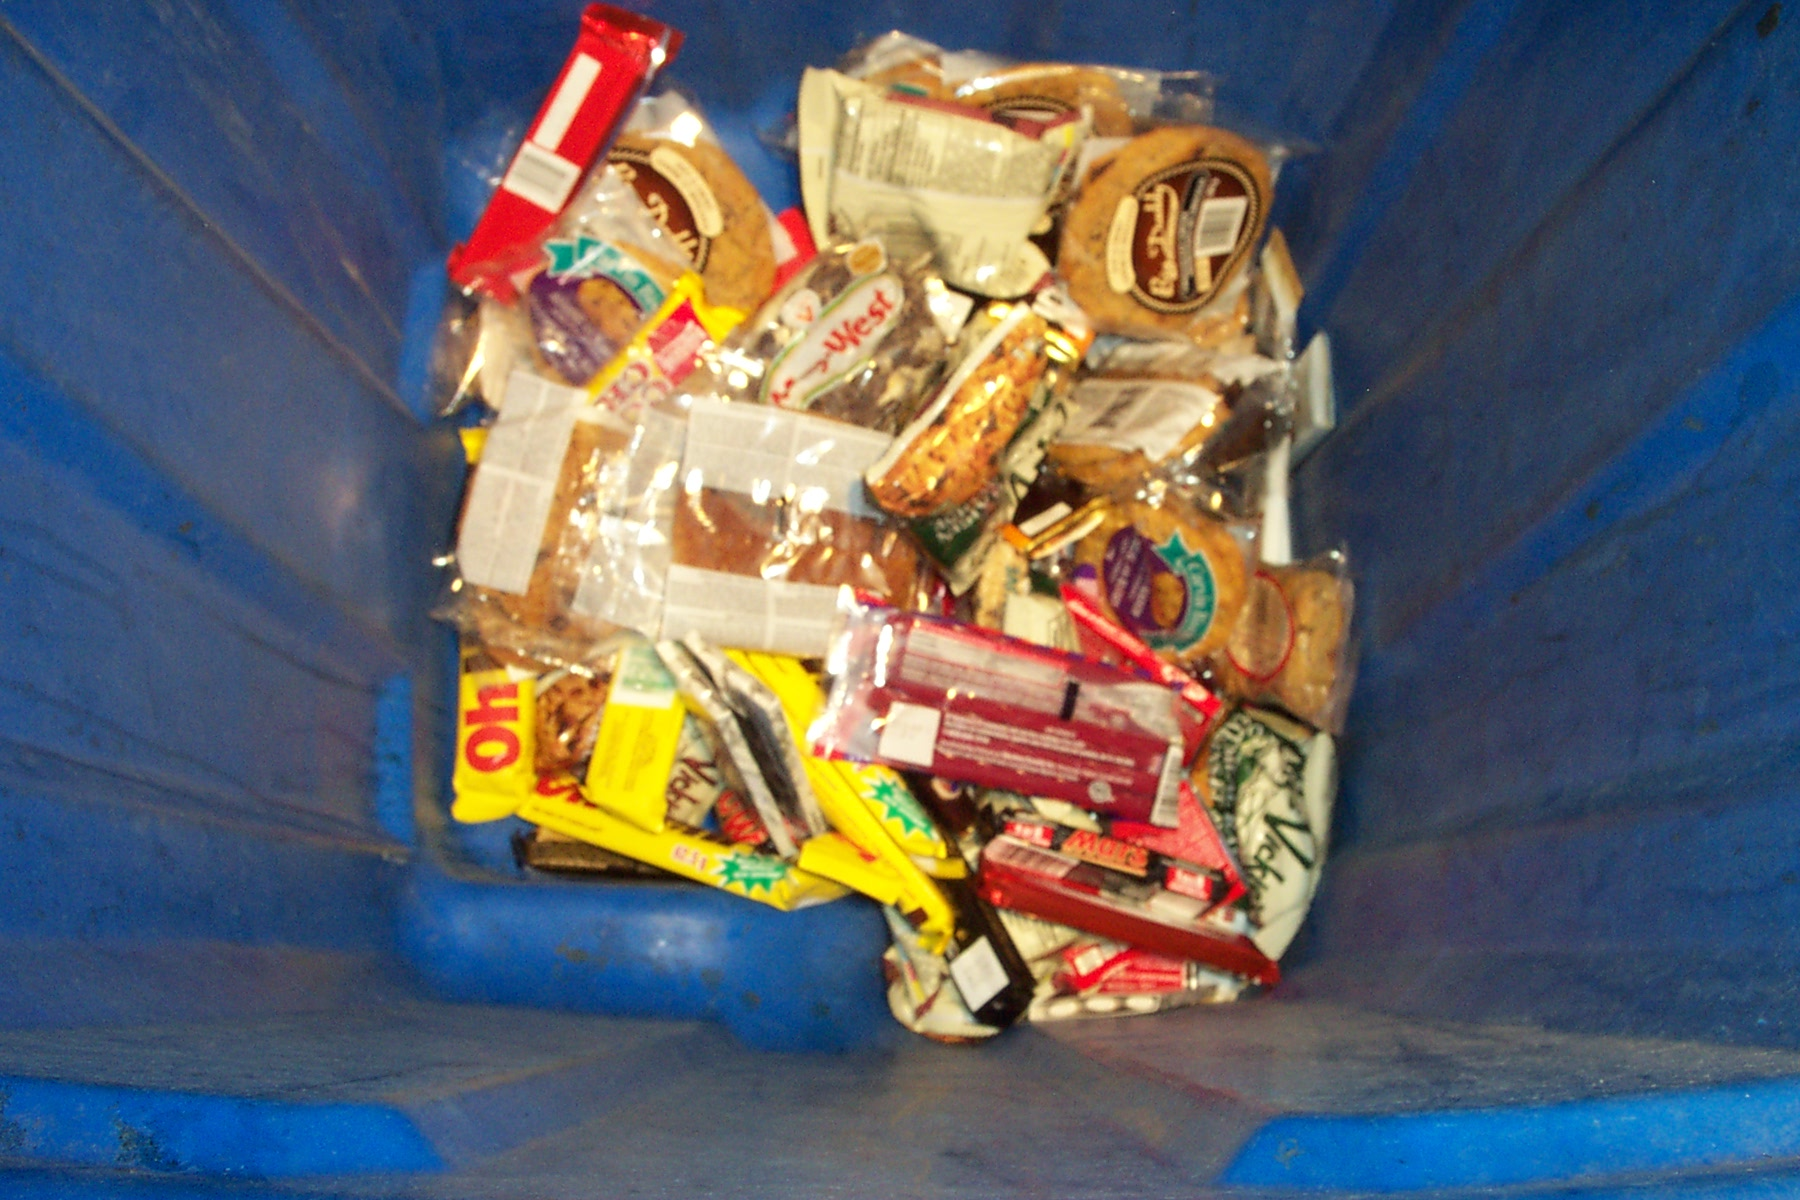 magic blue bin of candy.JPG